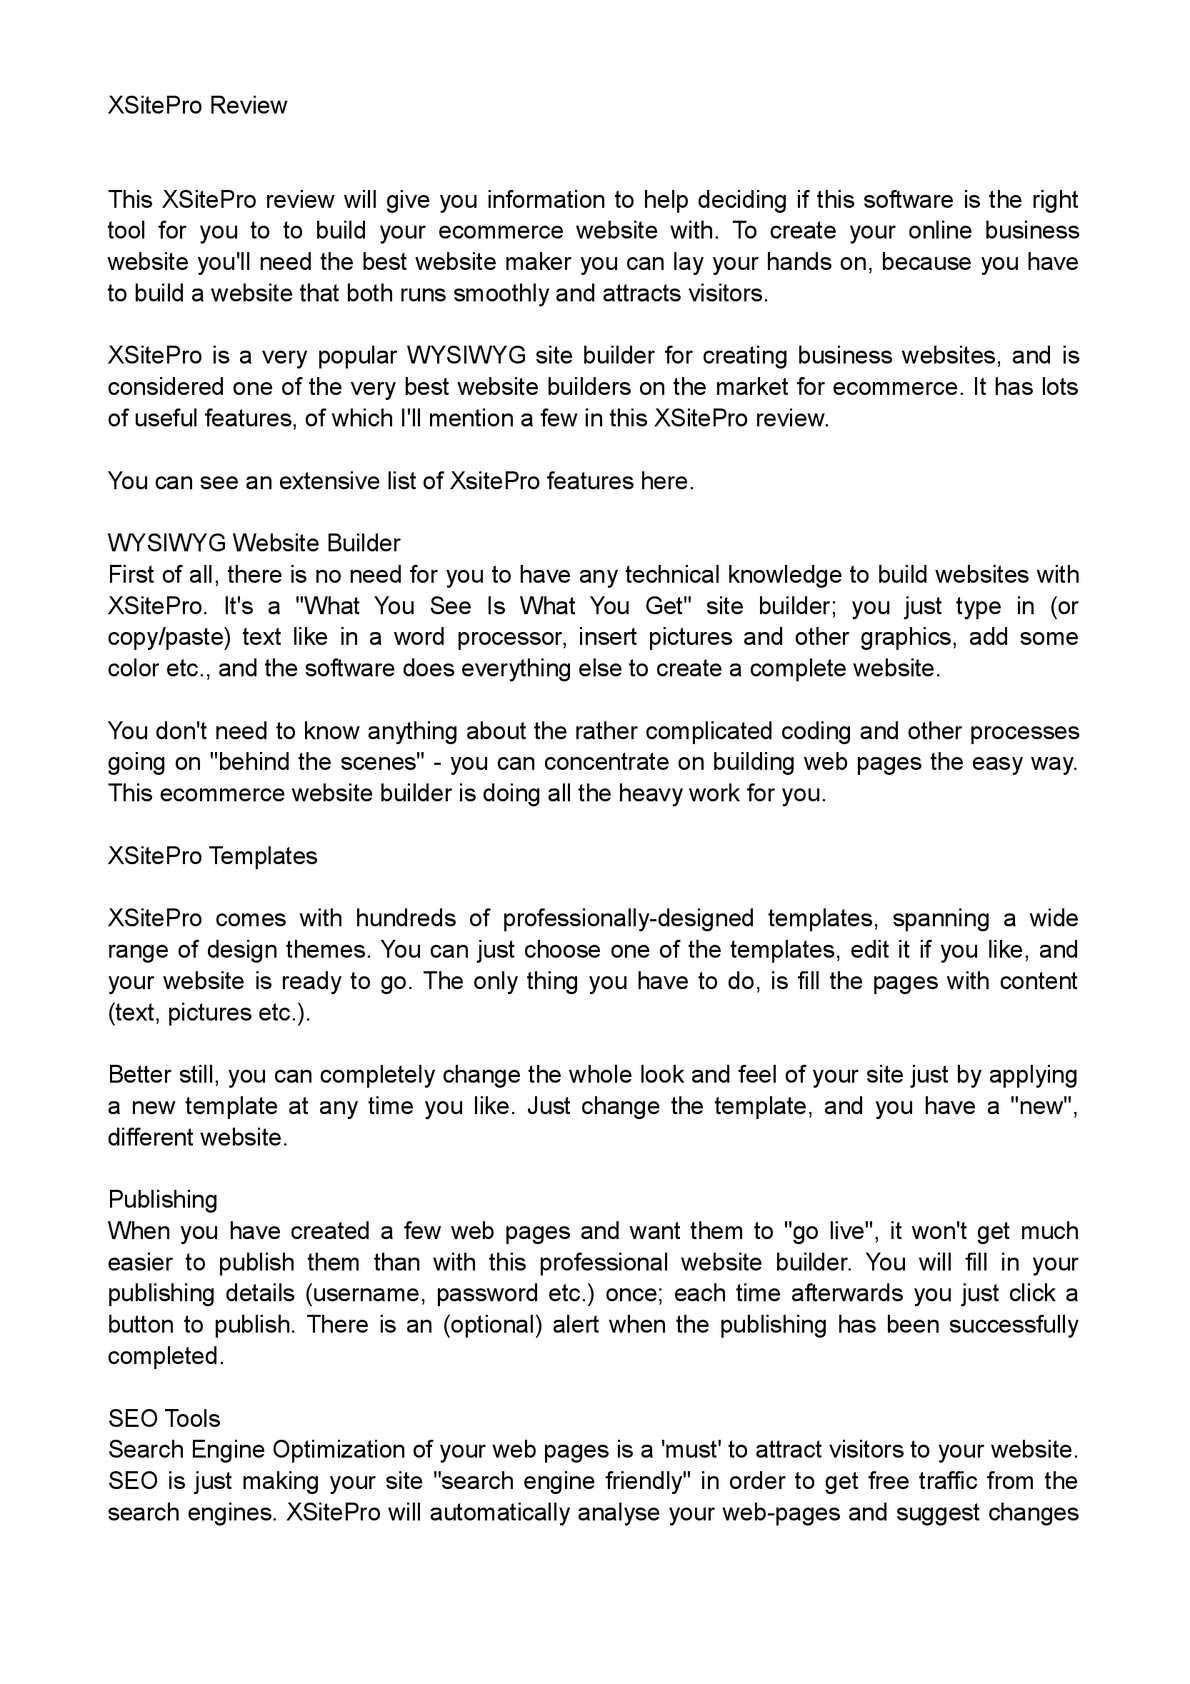 Website design archives fabian lim's internet marketing blog.